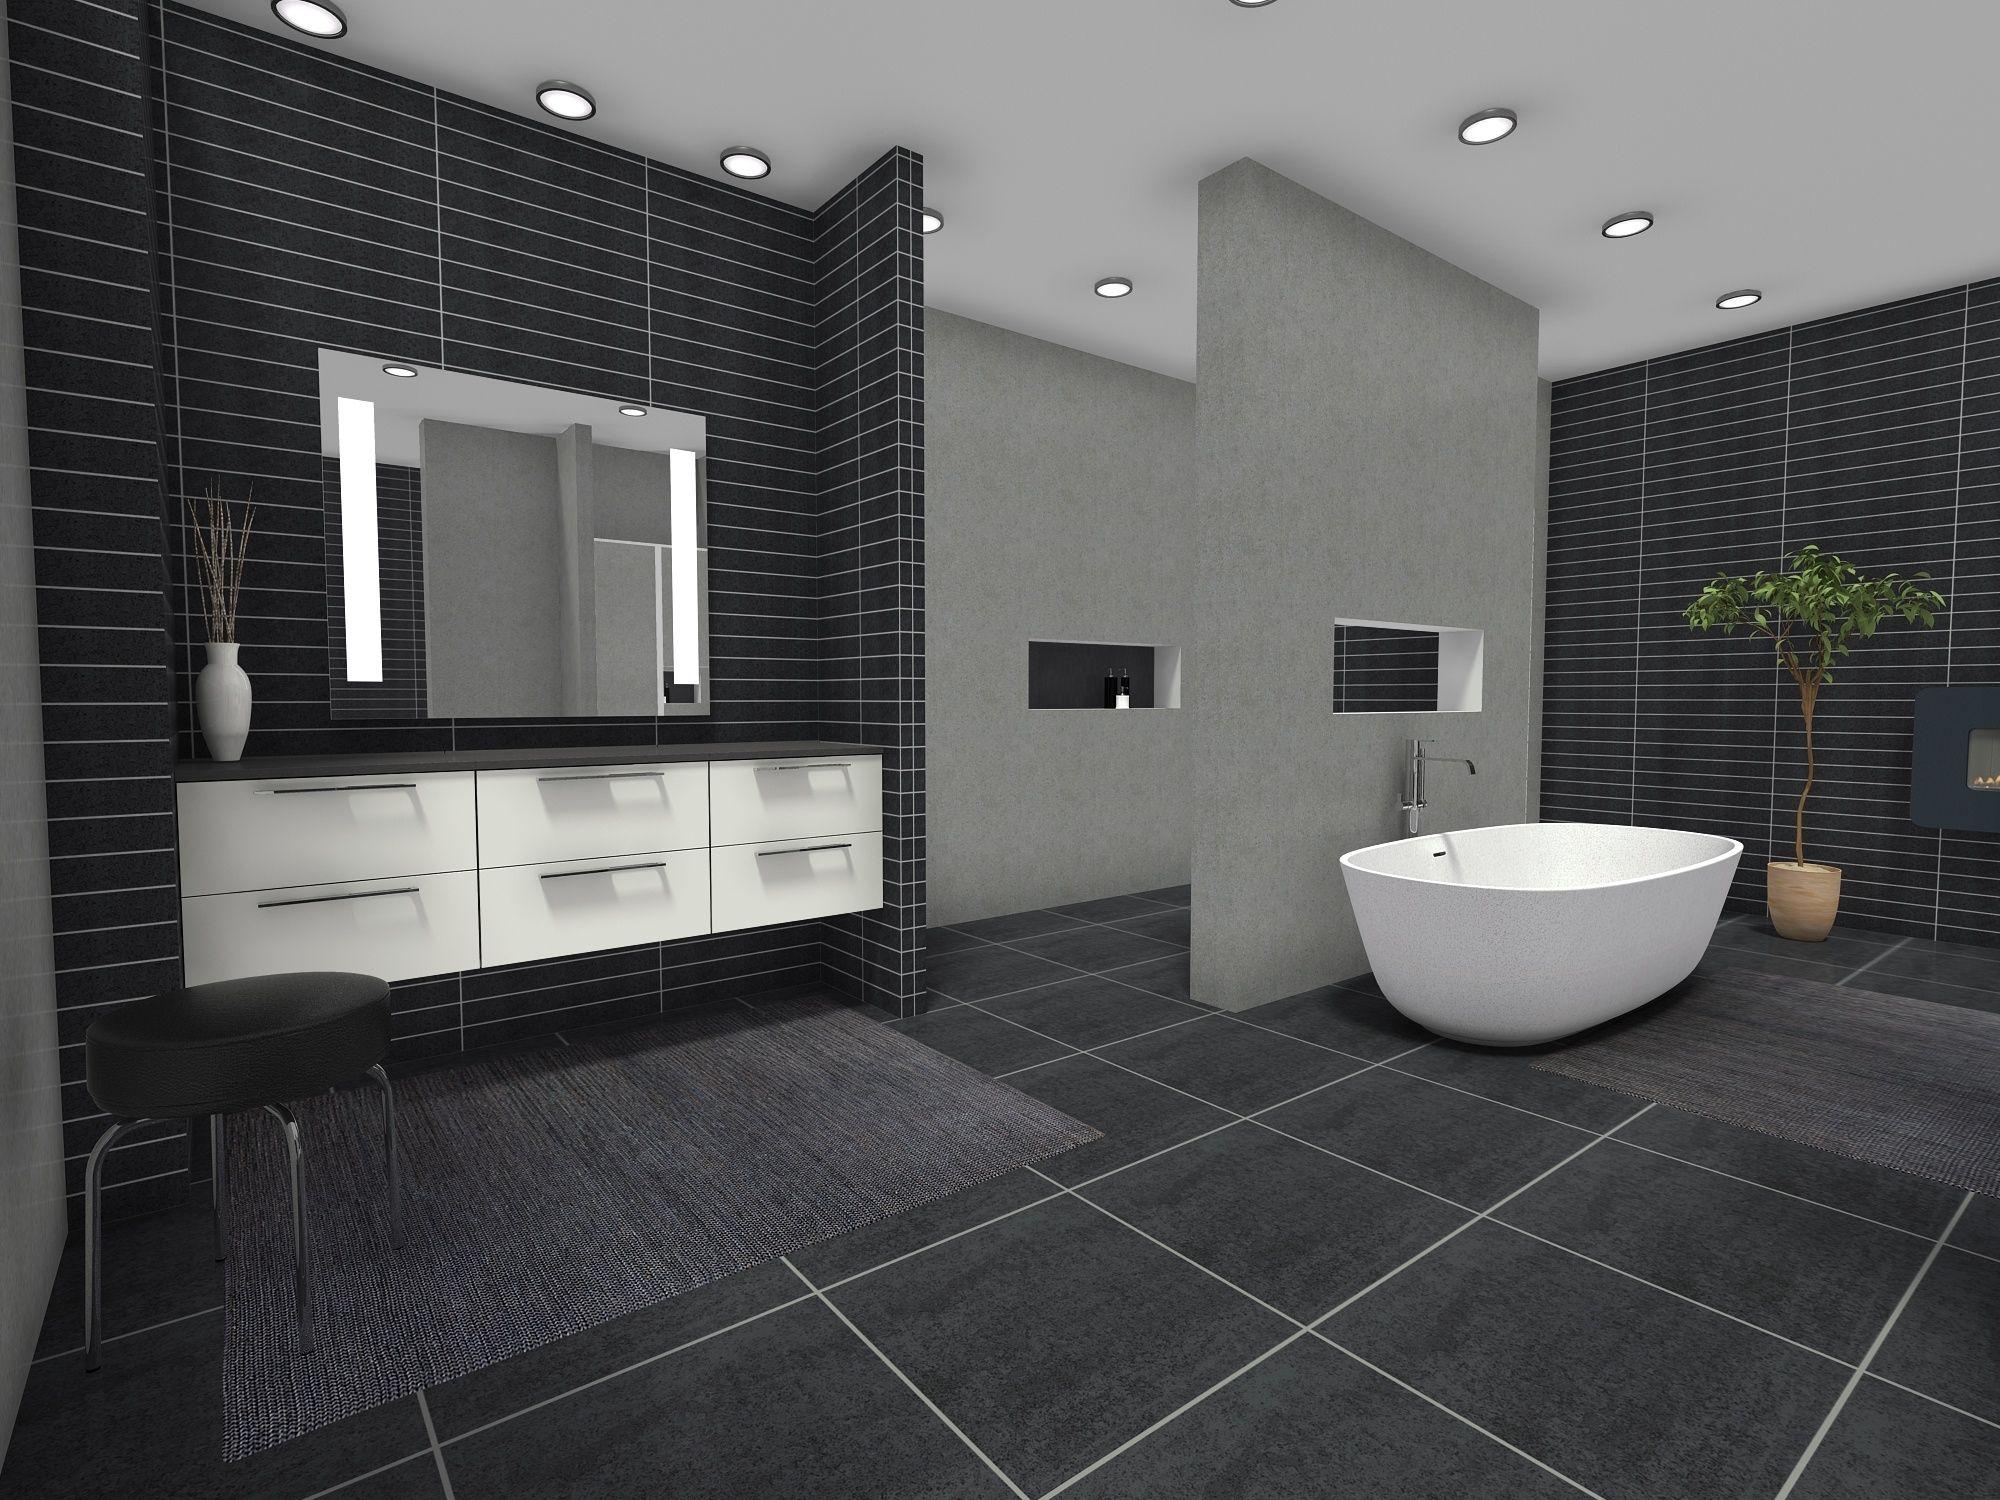 Top Tips To Create Your Contemporary Bathroom Style Bathroom Style Contemporary Bathrooms Contemporary Bathroom